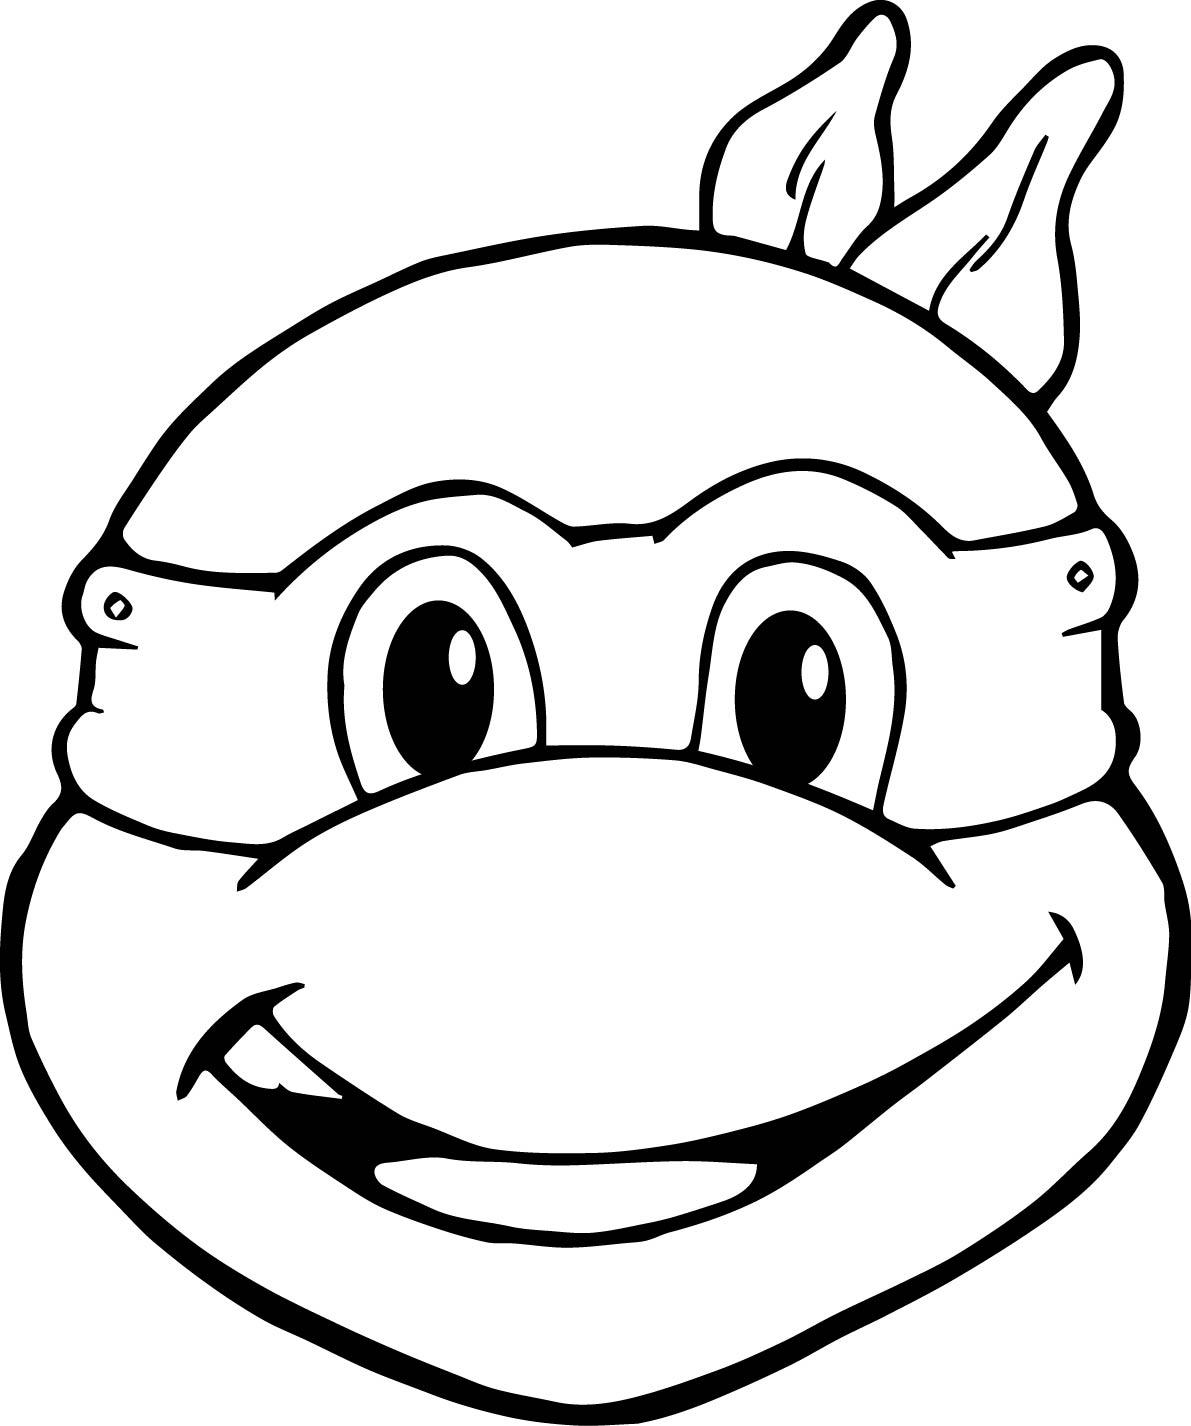 Ninja Turtle Face Drawing At Getdrawings